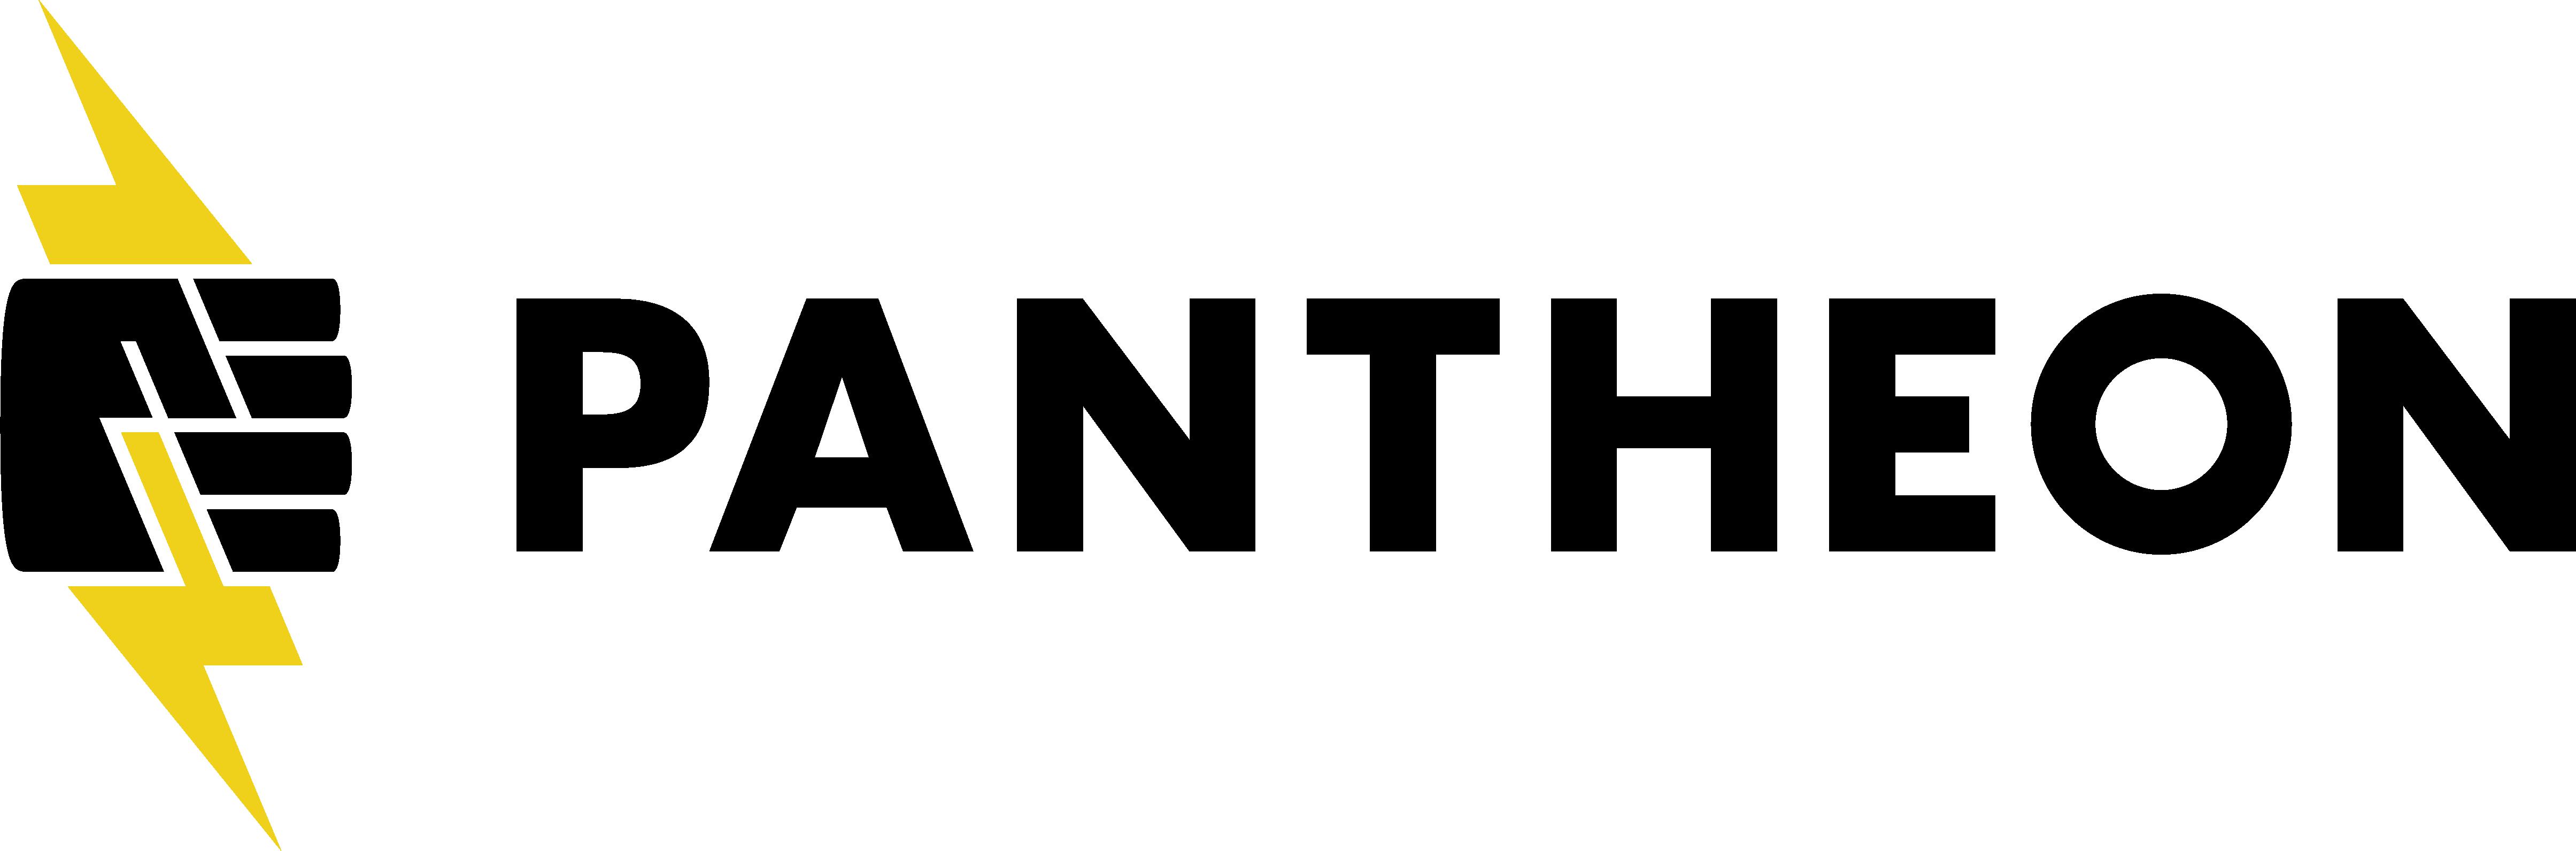 pantheon-9d52af5e52560719e230809b0e03d862